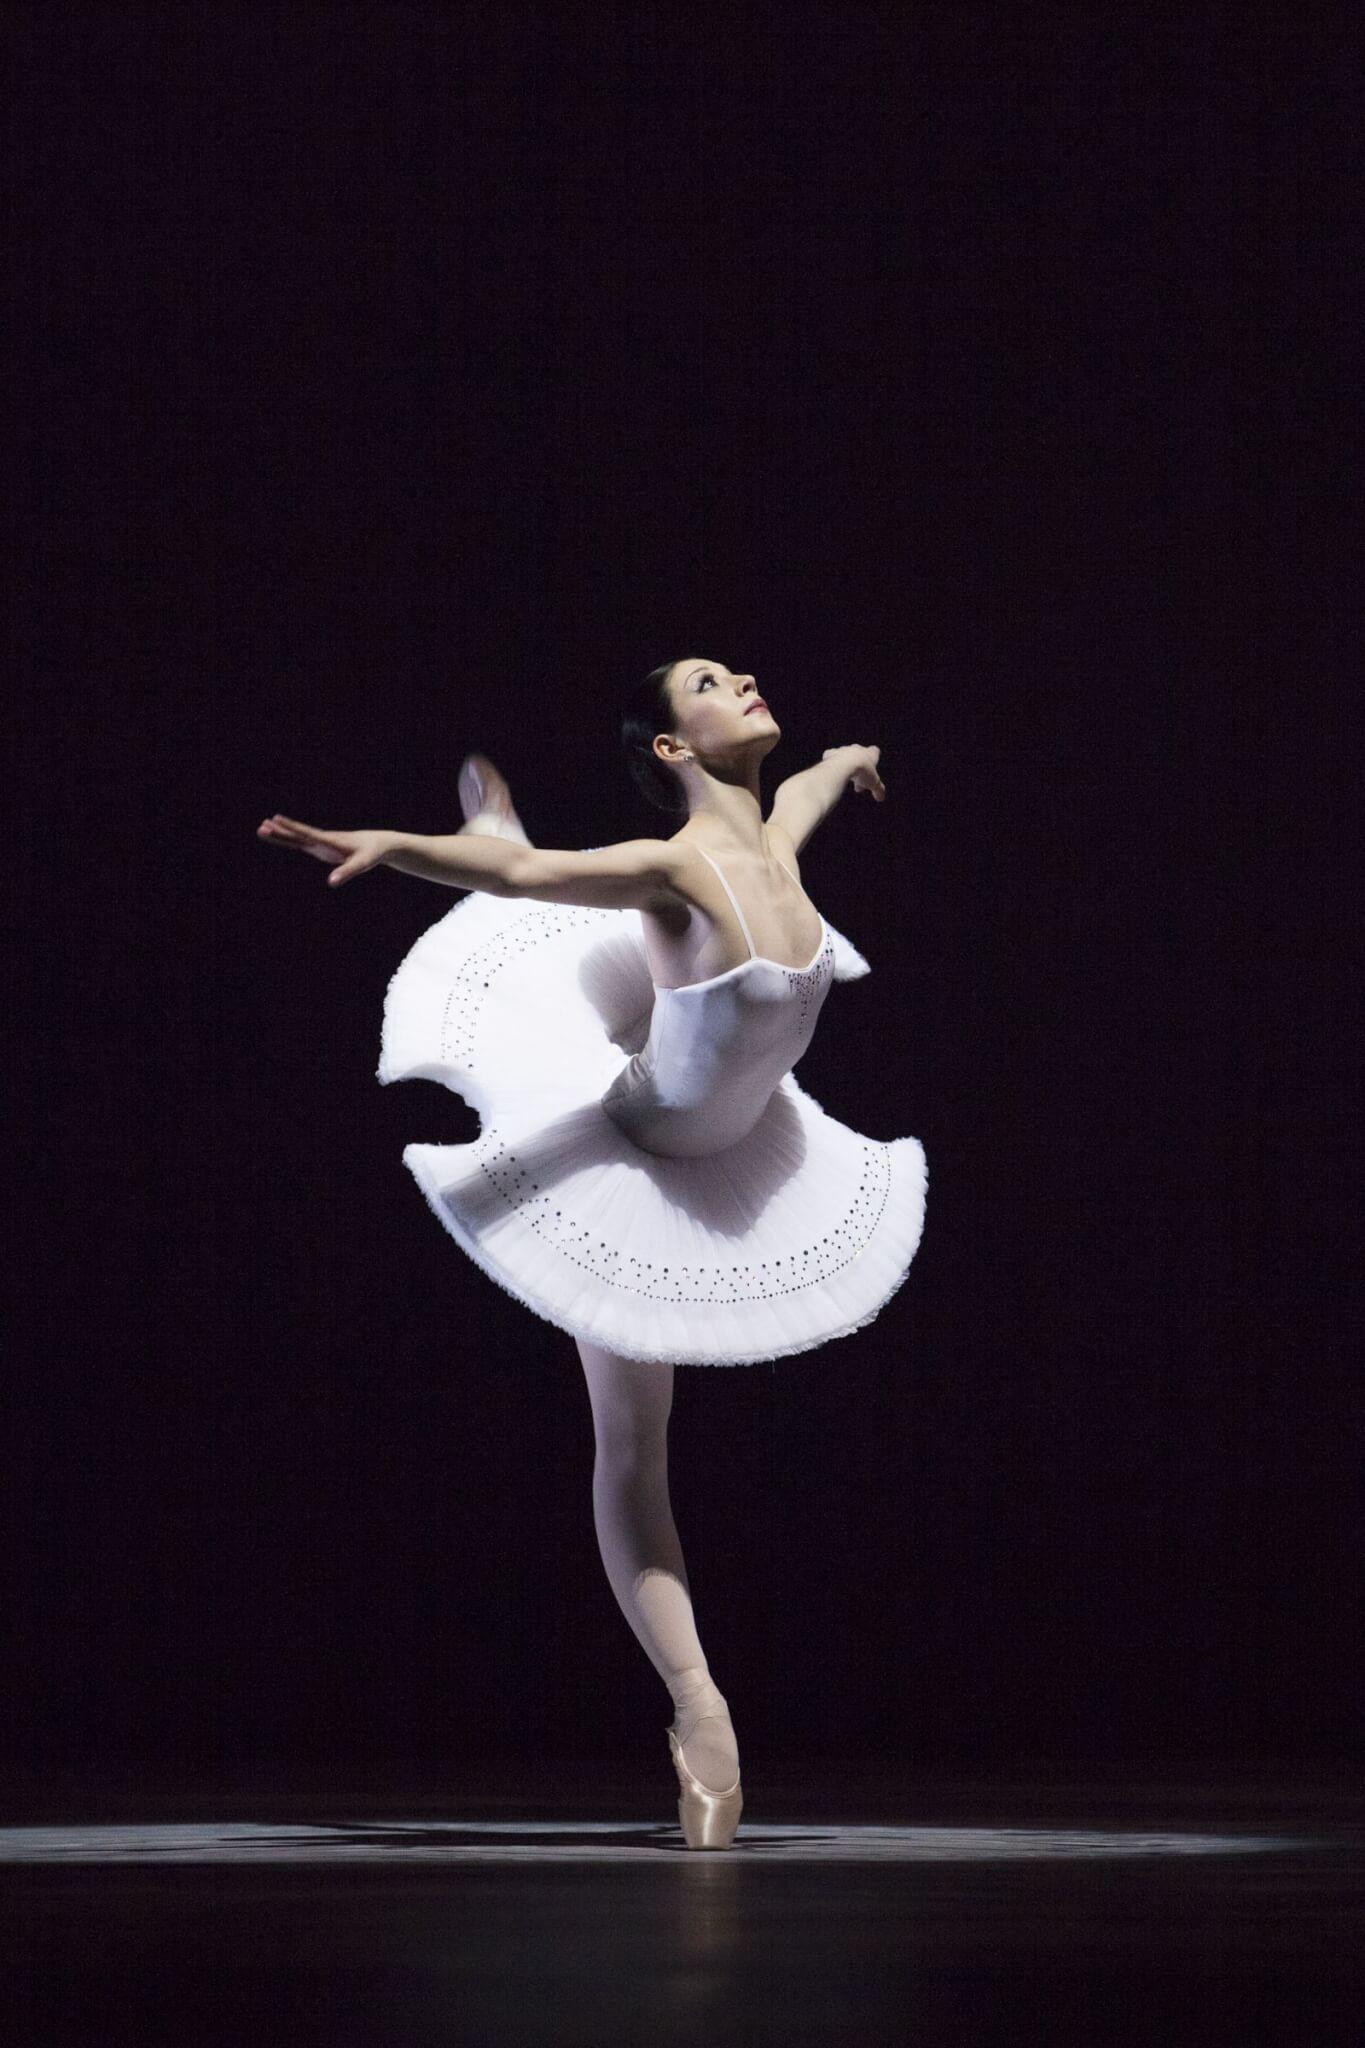 Viktor&Rolf為荷蘭國家芭蕾舞蹈團設計的tutu舞裙